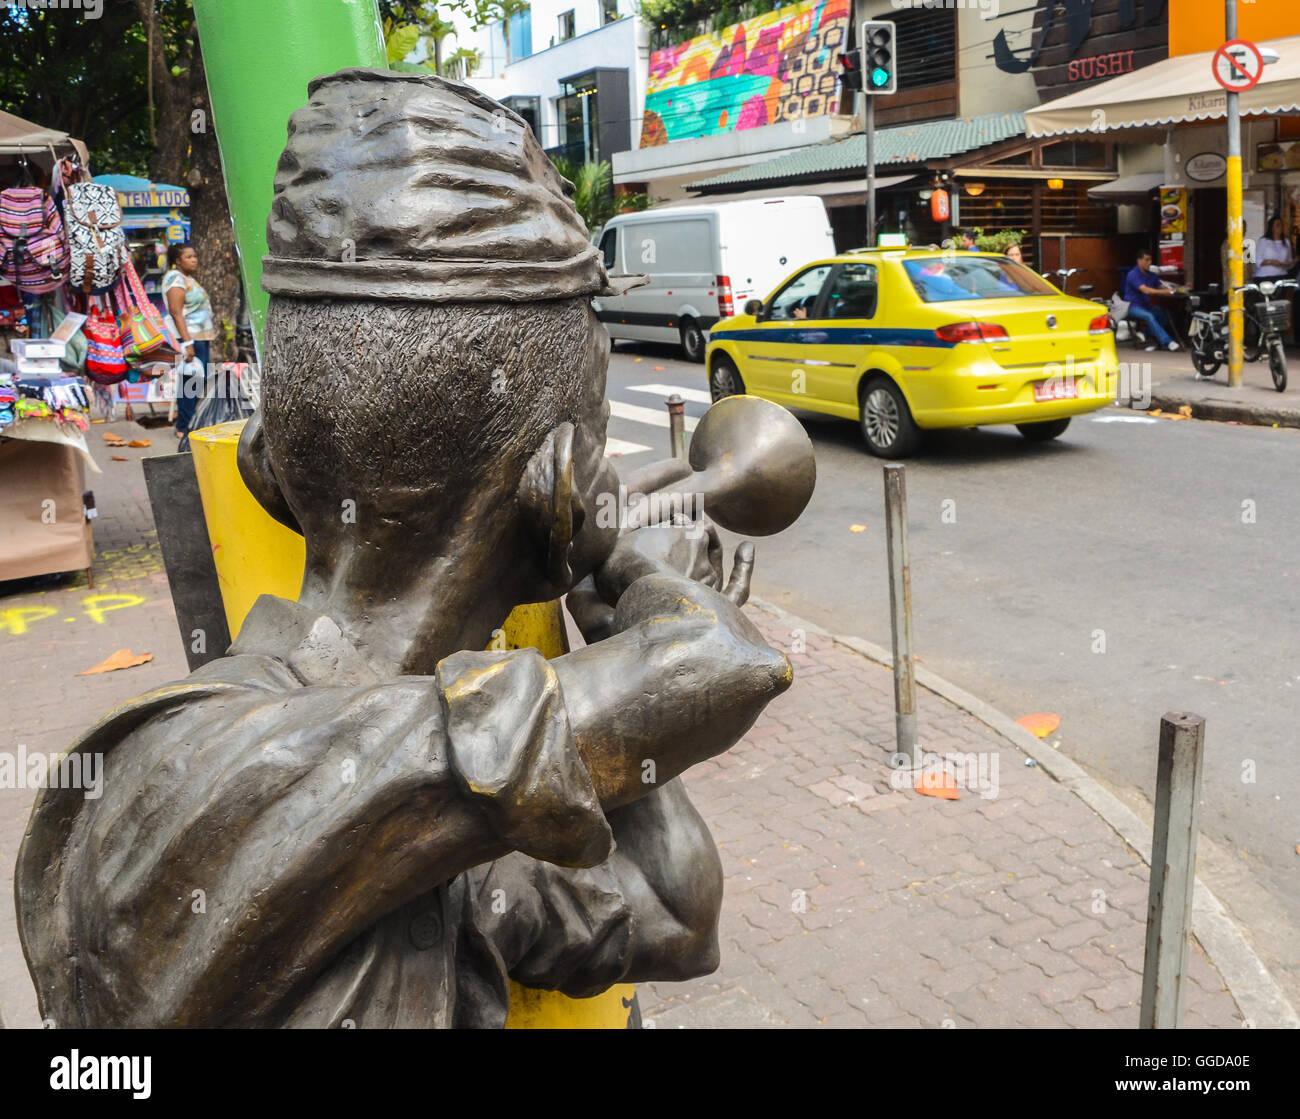 a-bossa-nova-statue-in-ipanema-rio-de-janeiro-brazil-GGDA0E.jpg